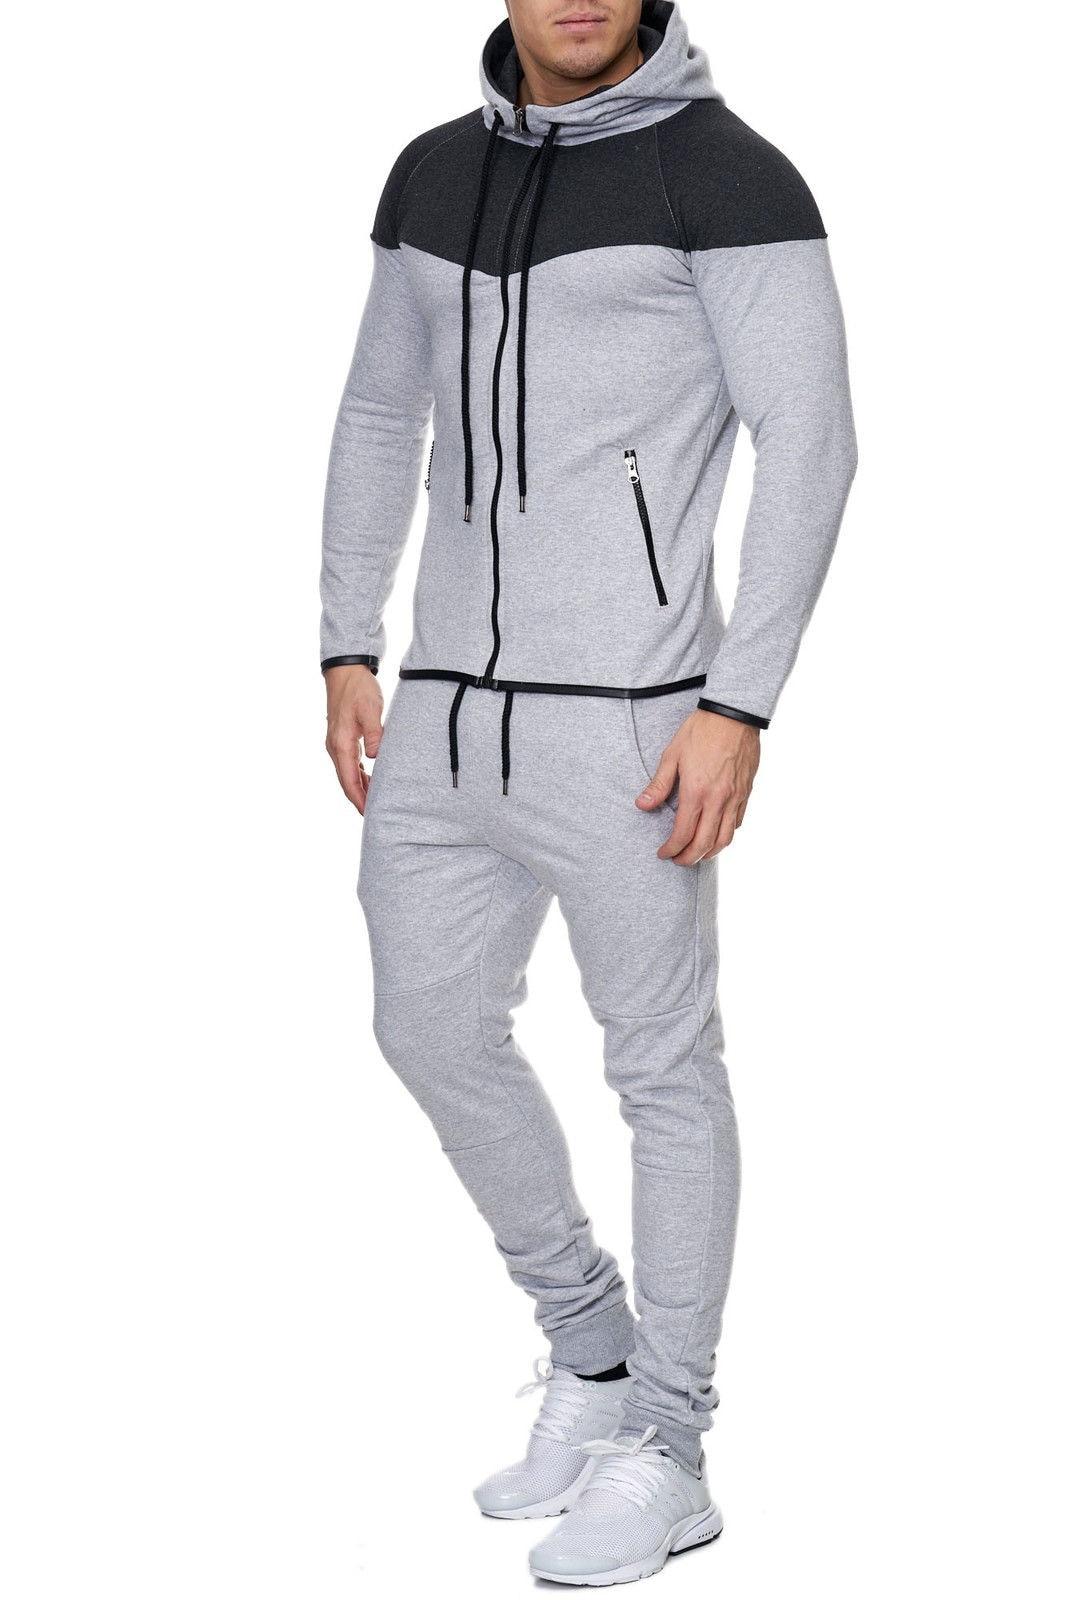 Zogaa Mens Track Suit Casual 2 Piece Set Fashion Color Block Hooded Sportswear Sweatsuit For Male Survetement Men Sportsuit